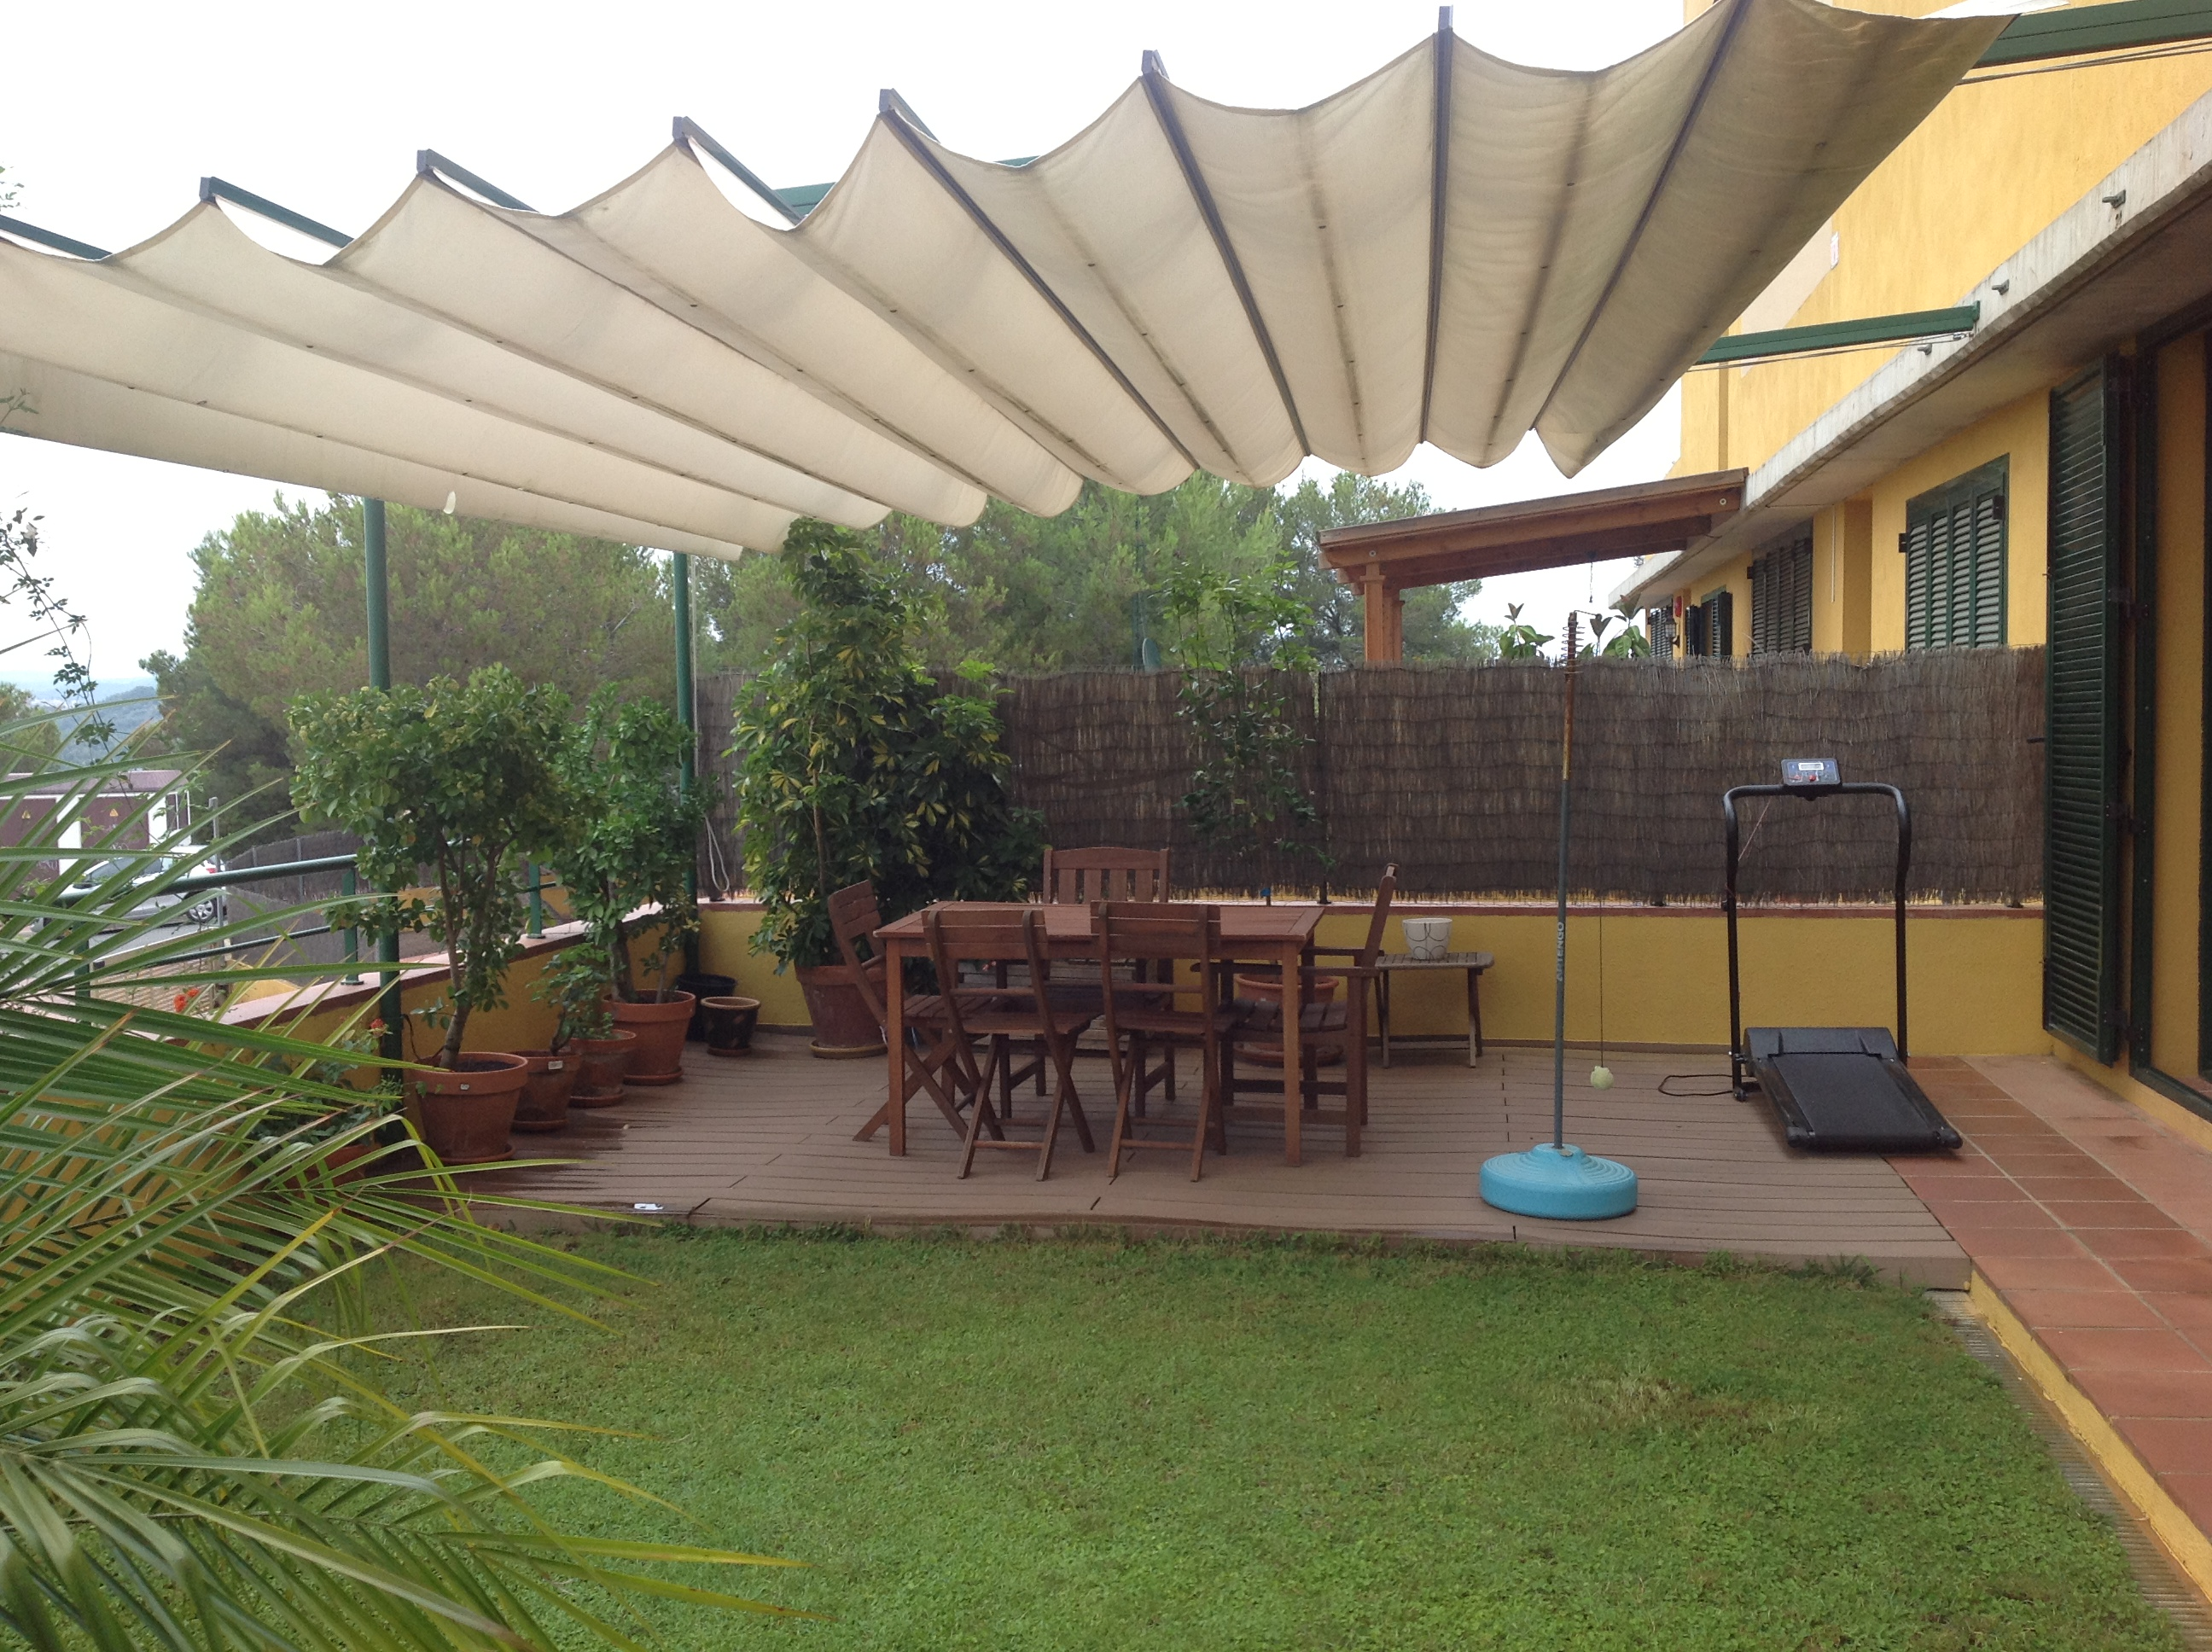 Таунхаус в Таррагона - Коста Дорада, площадь 200 м², 3 спальни